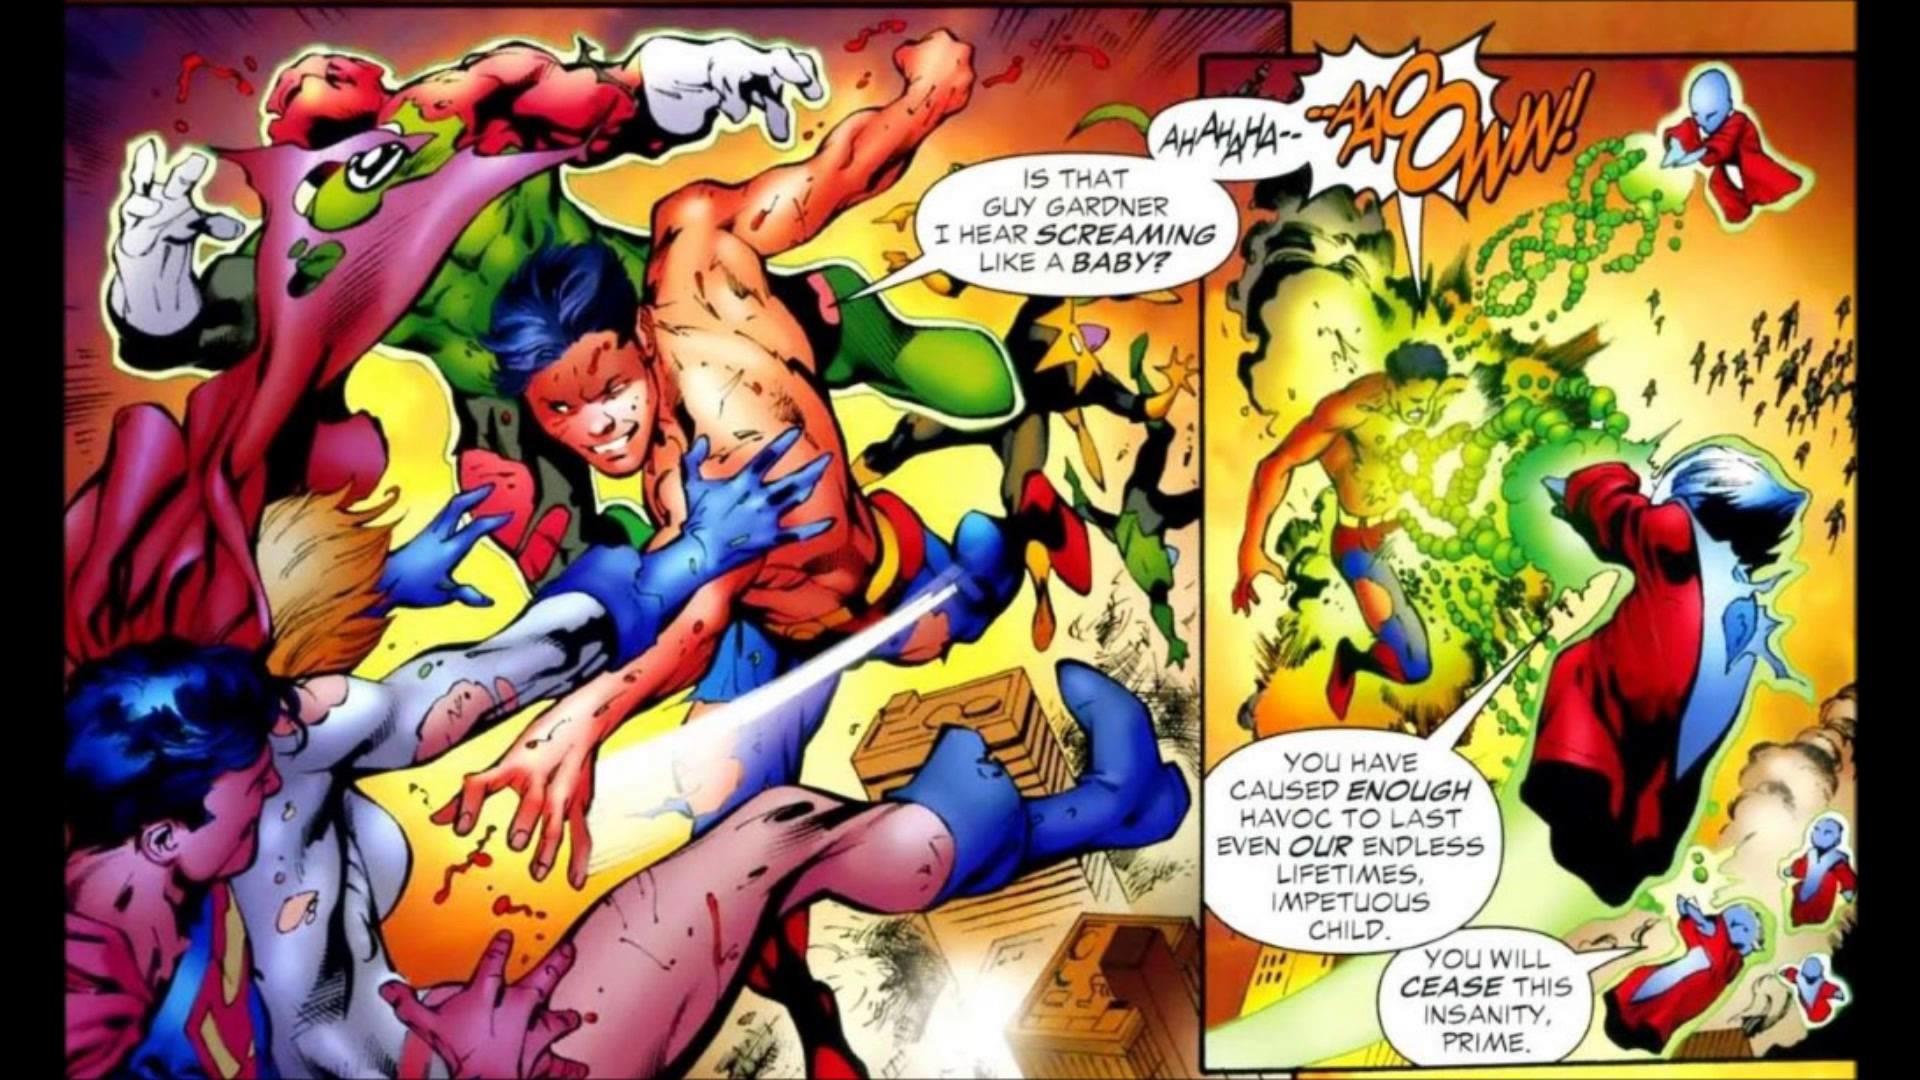 Res: 1920x1080, Superboy-Prime-vs-Everyone